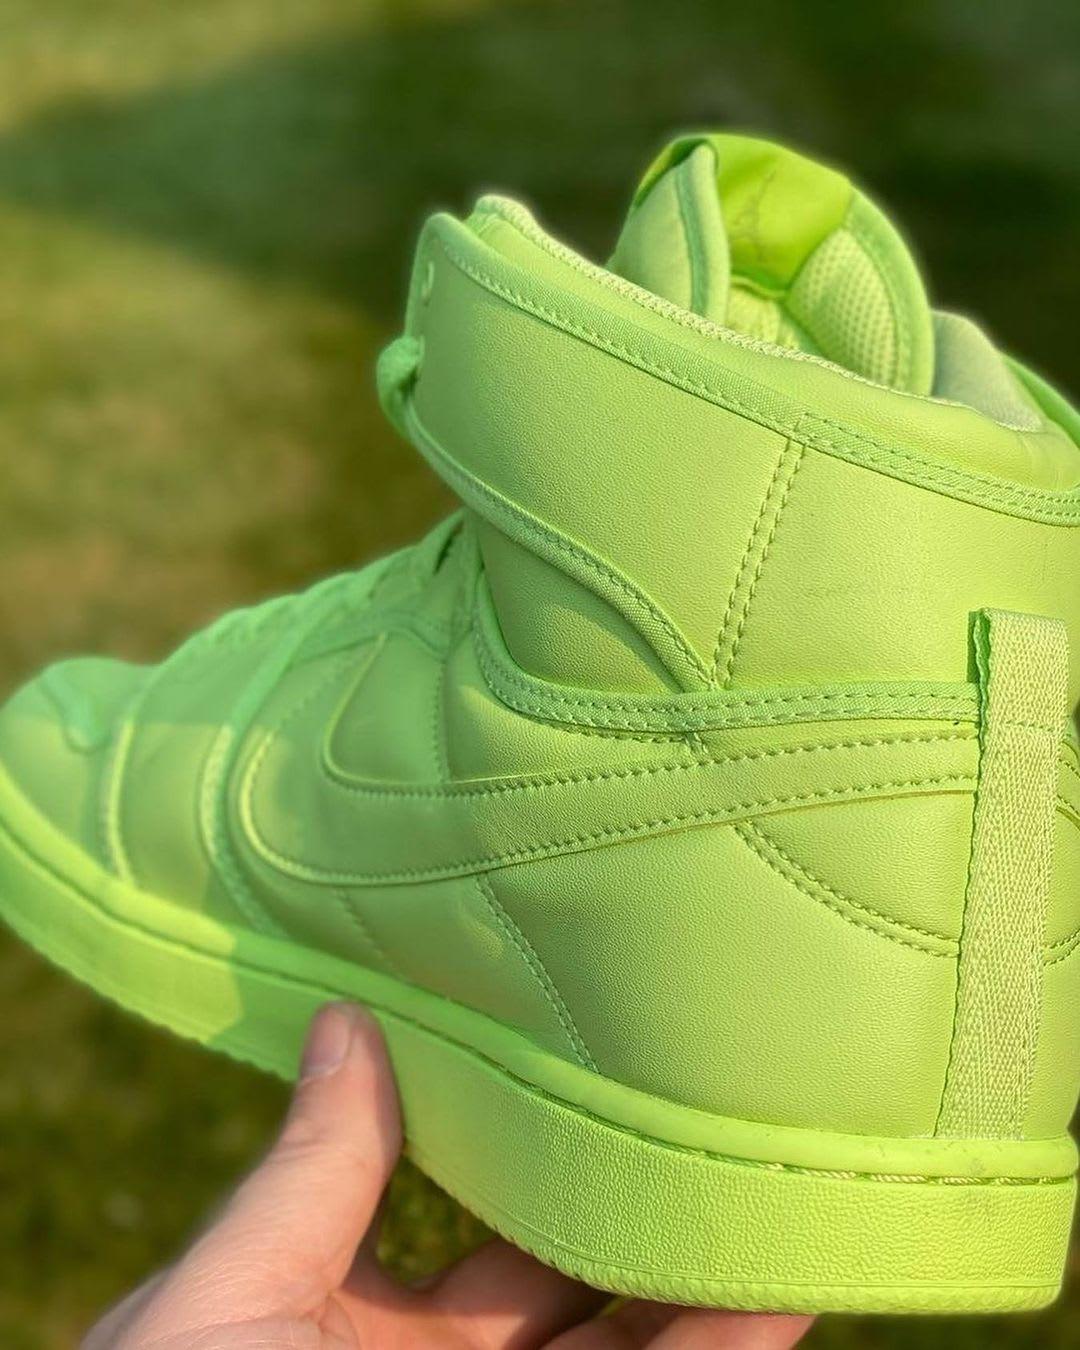 Billie Eilish x Air Jordan 1 KO 'Ghost Green' DN2857-330 (Heel)